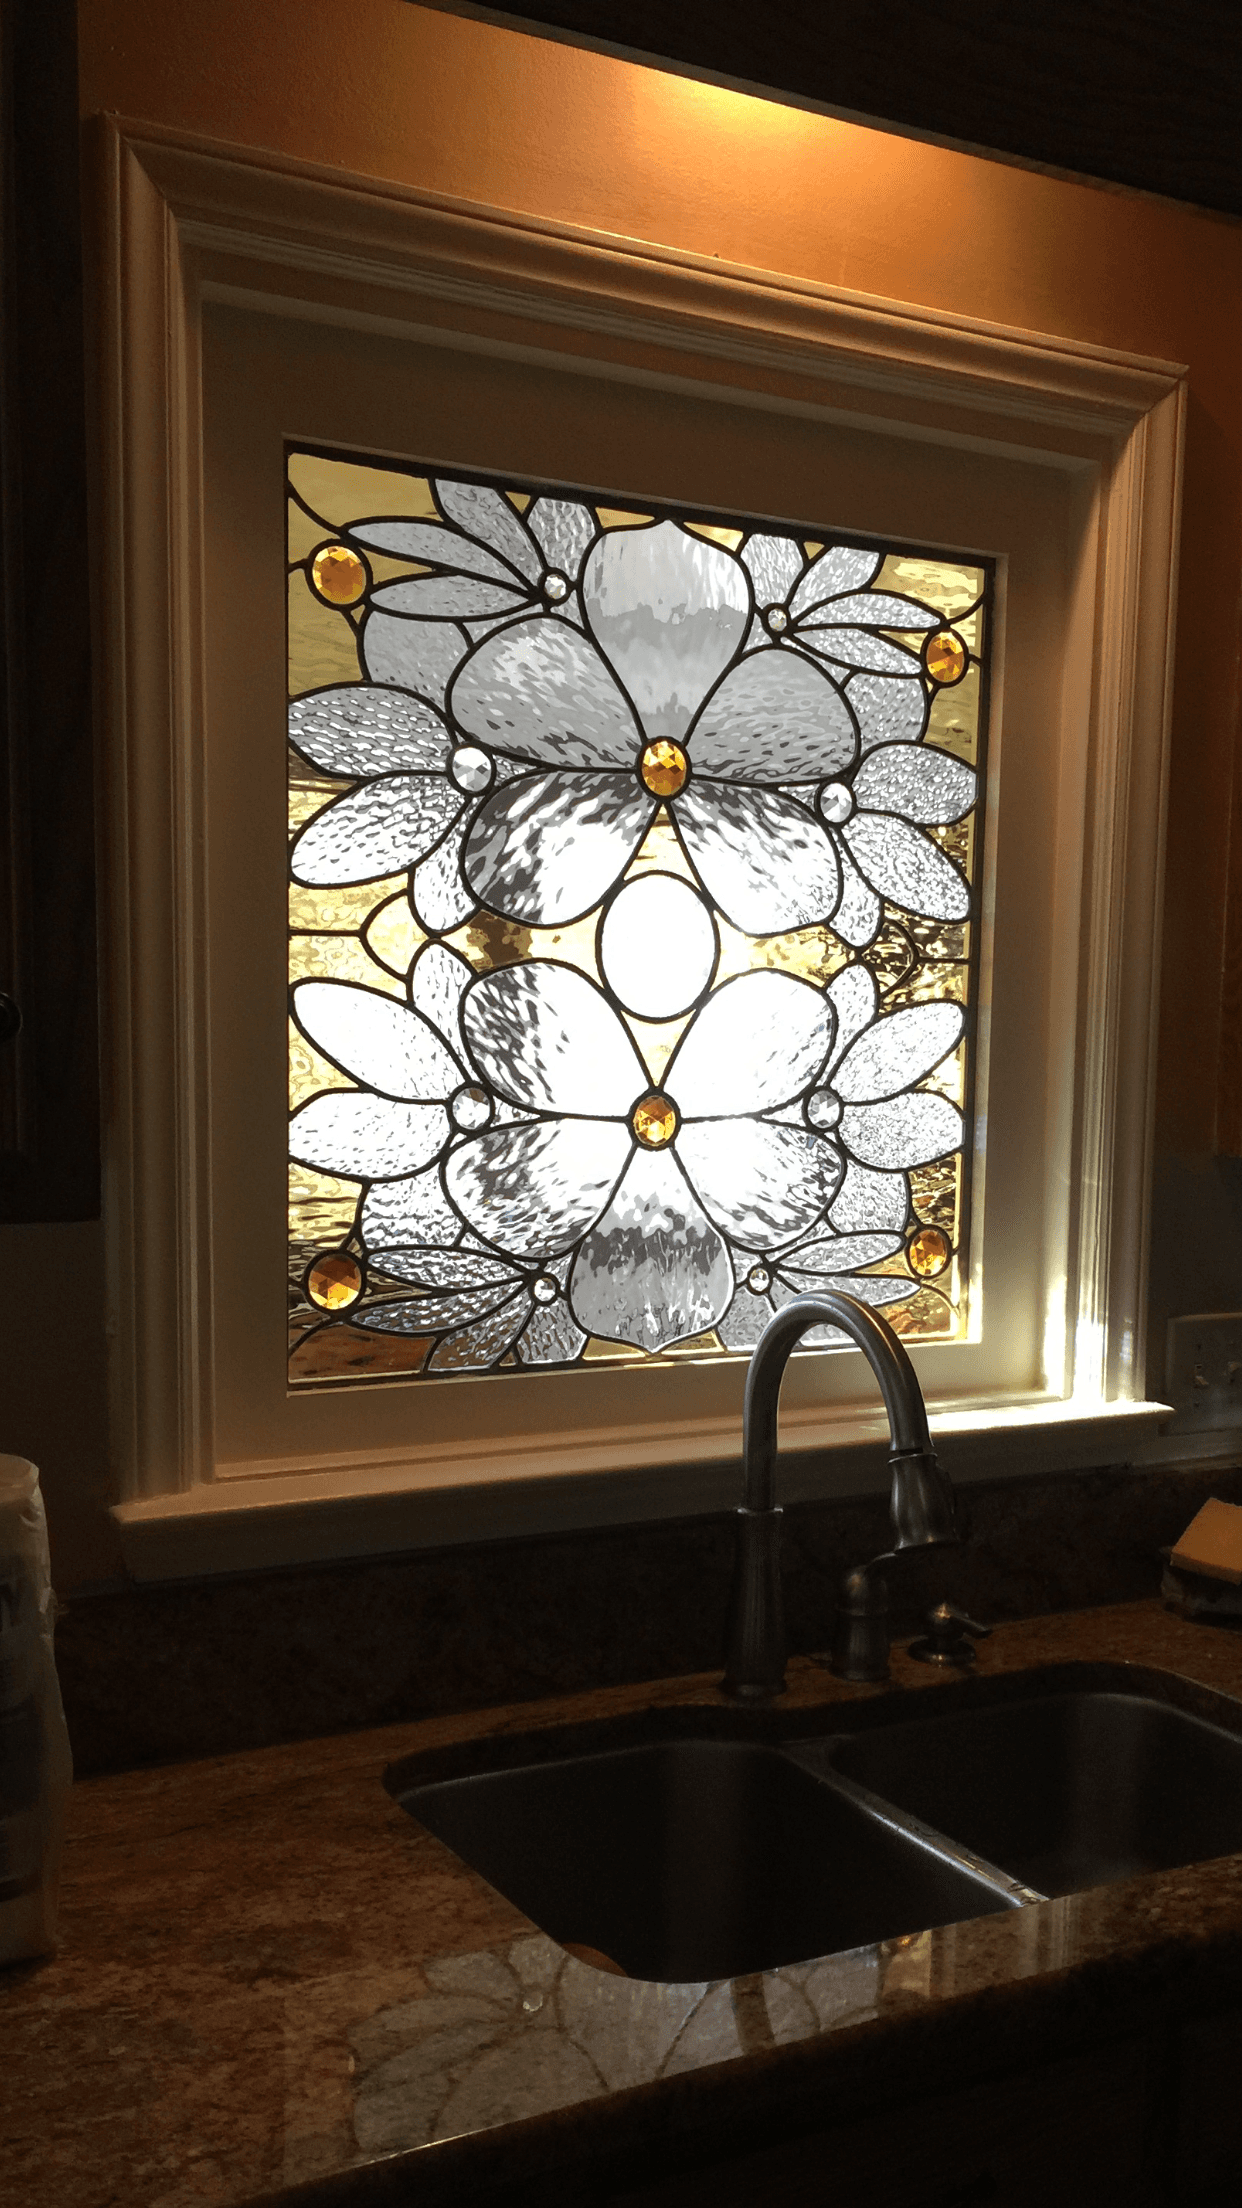 18-Tess window-1242x2208.png